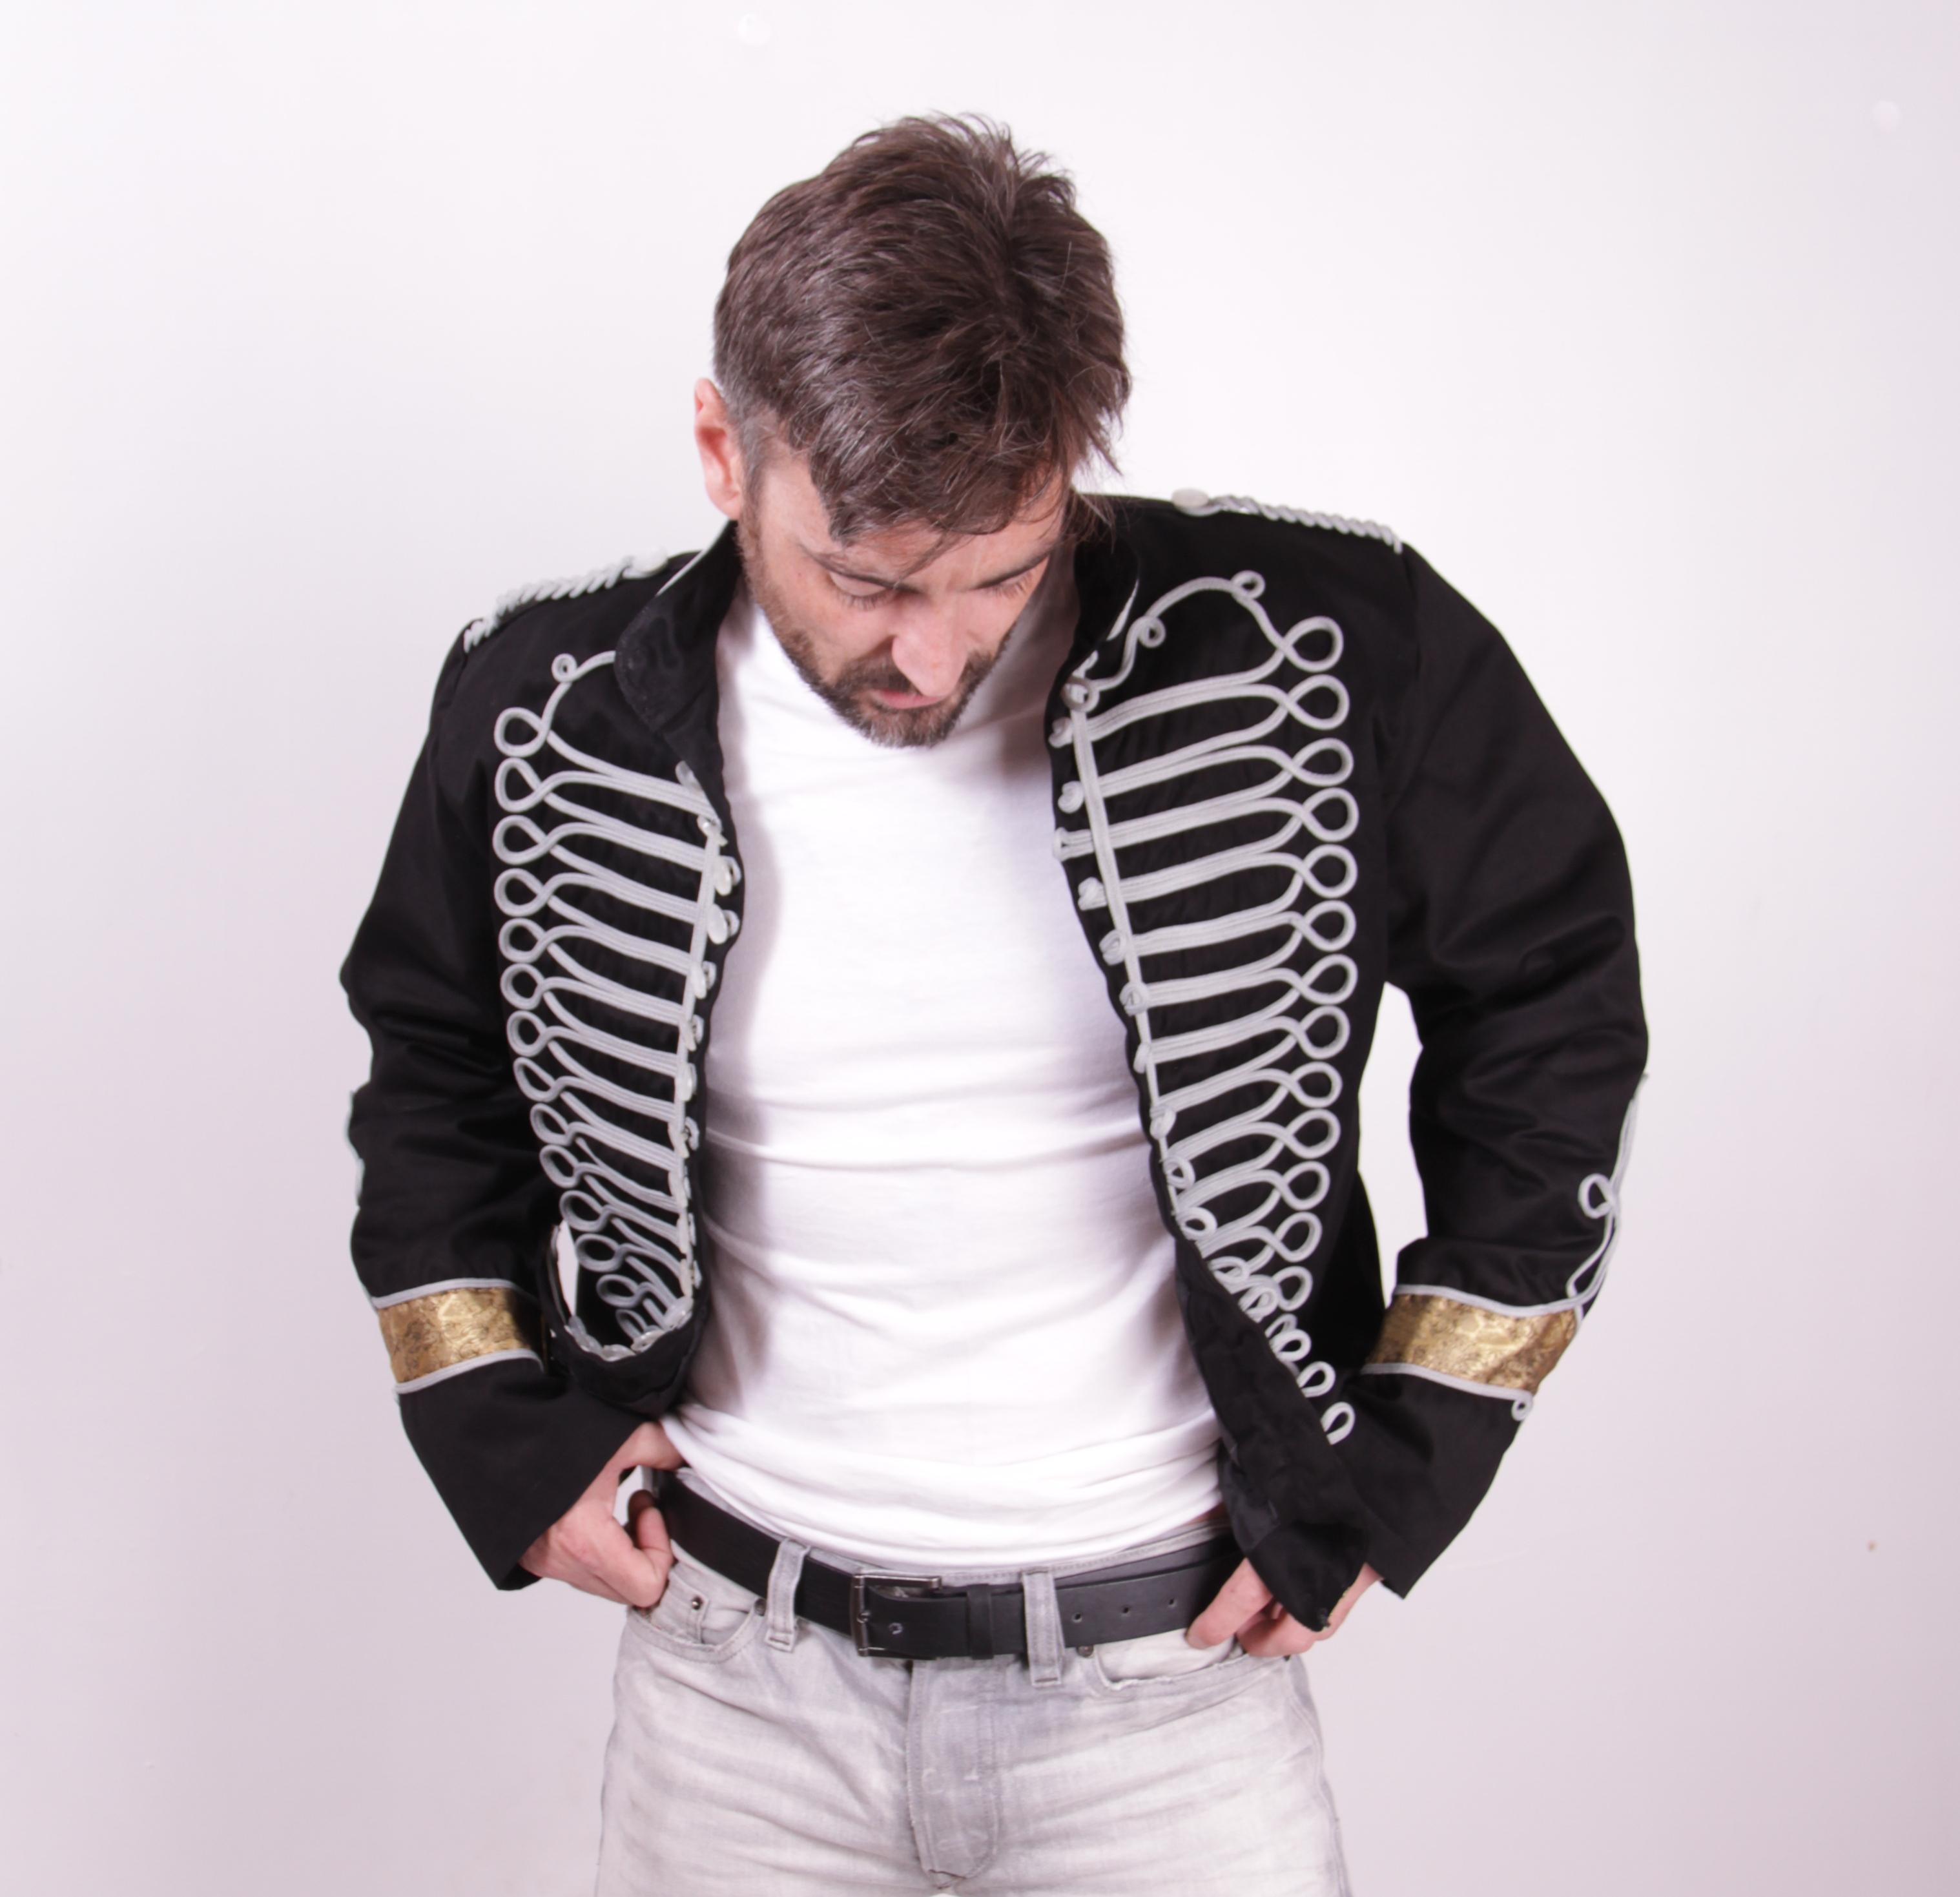 hedj_military_style_jacket_lady_ks_black_jackets_and_outerwear_3.JPG